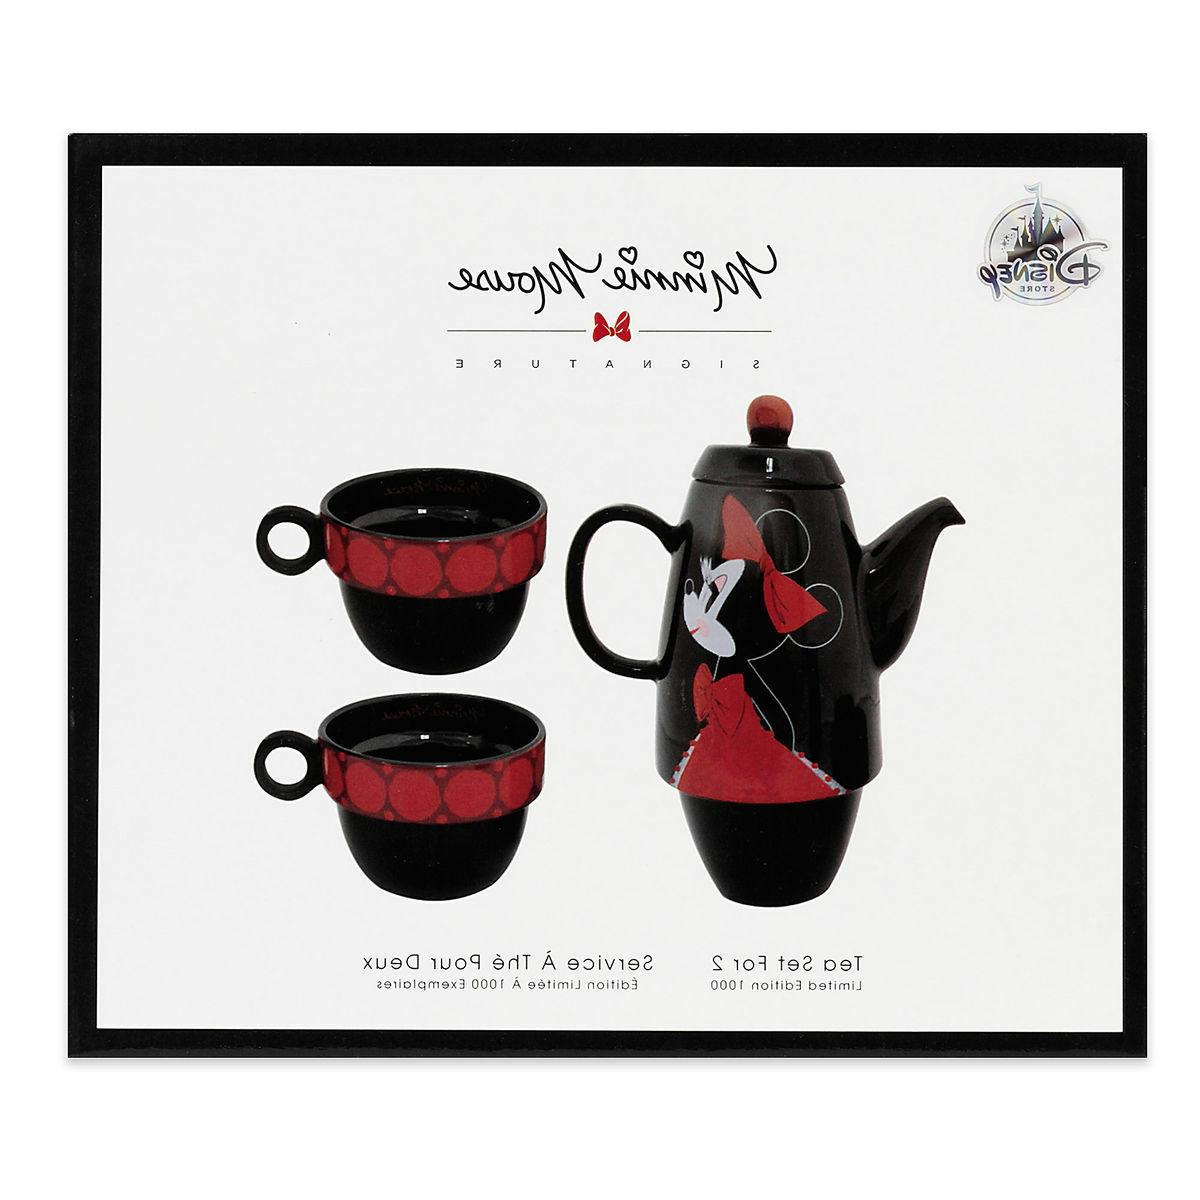 DISNEY TEA SET Signature Edition 1000